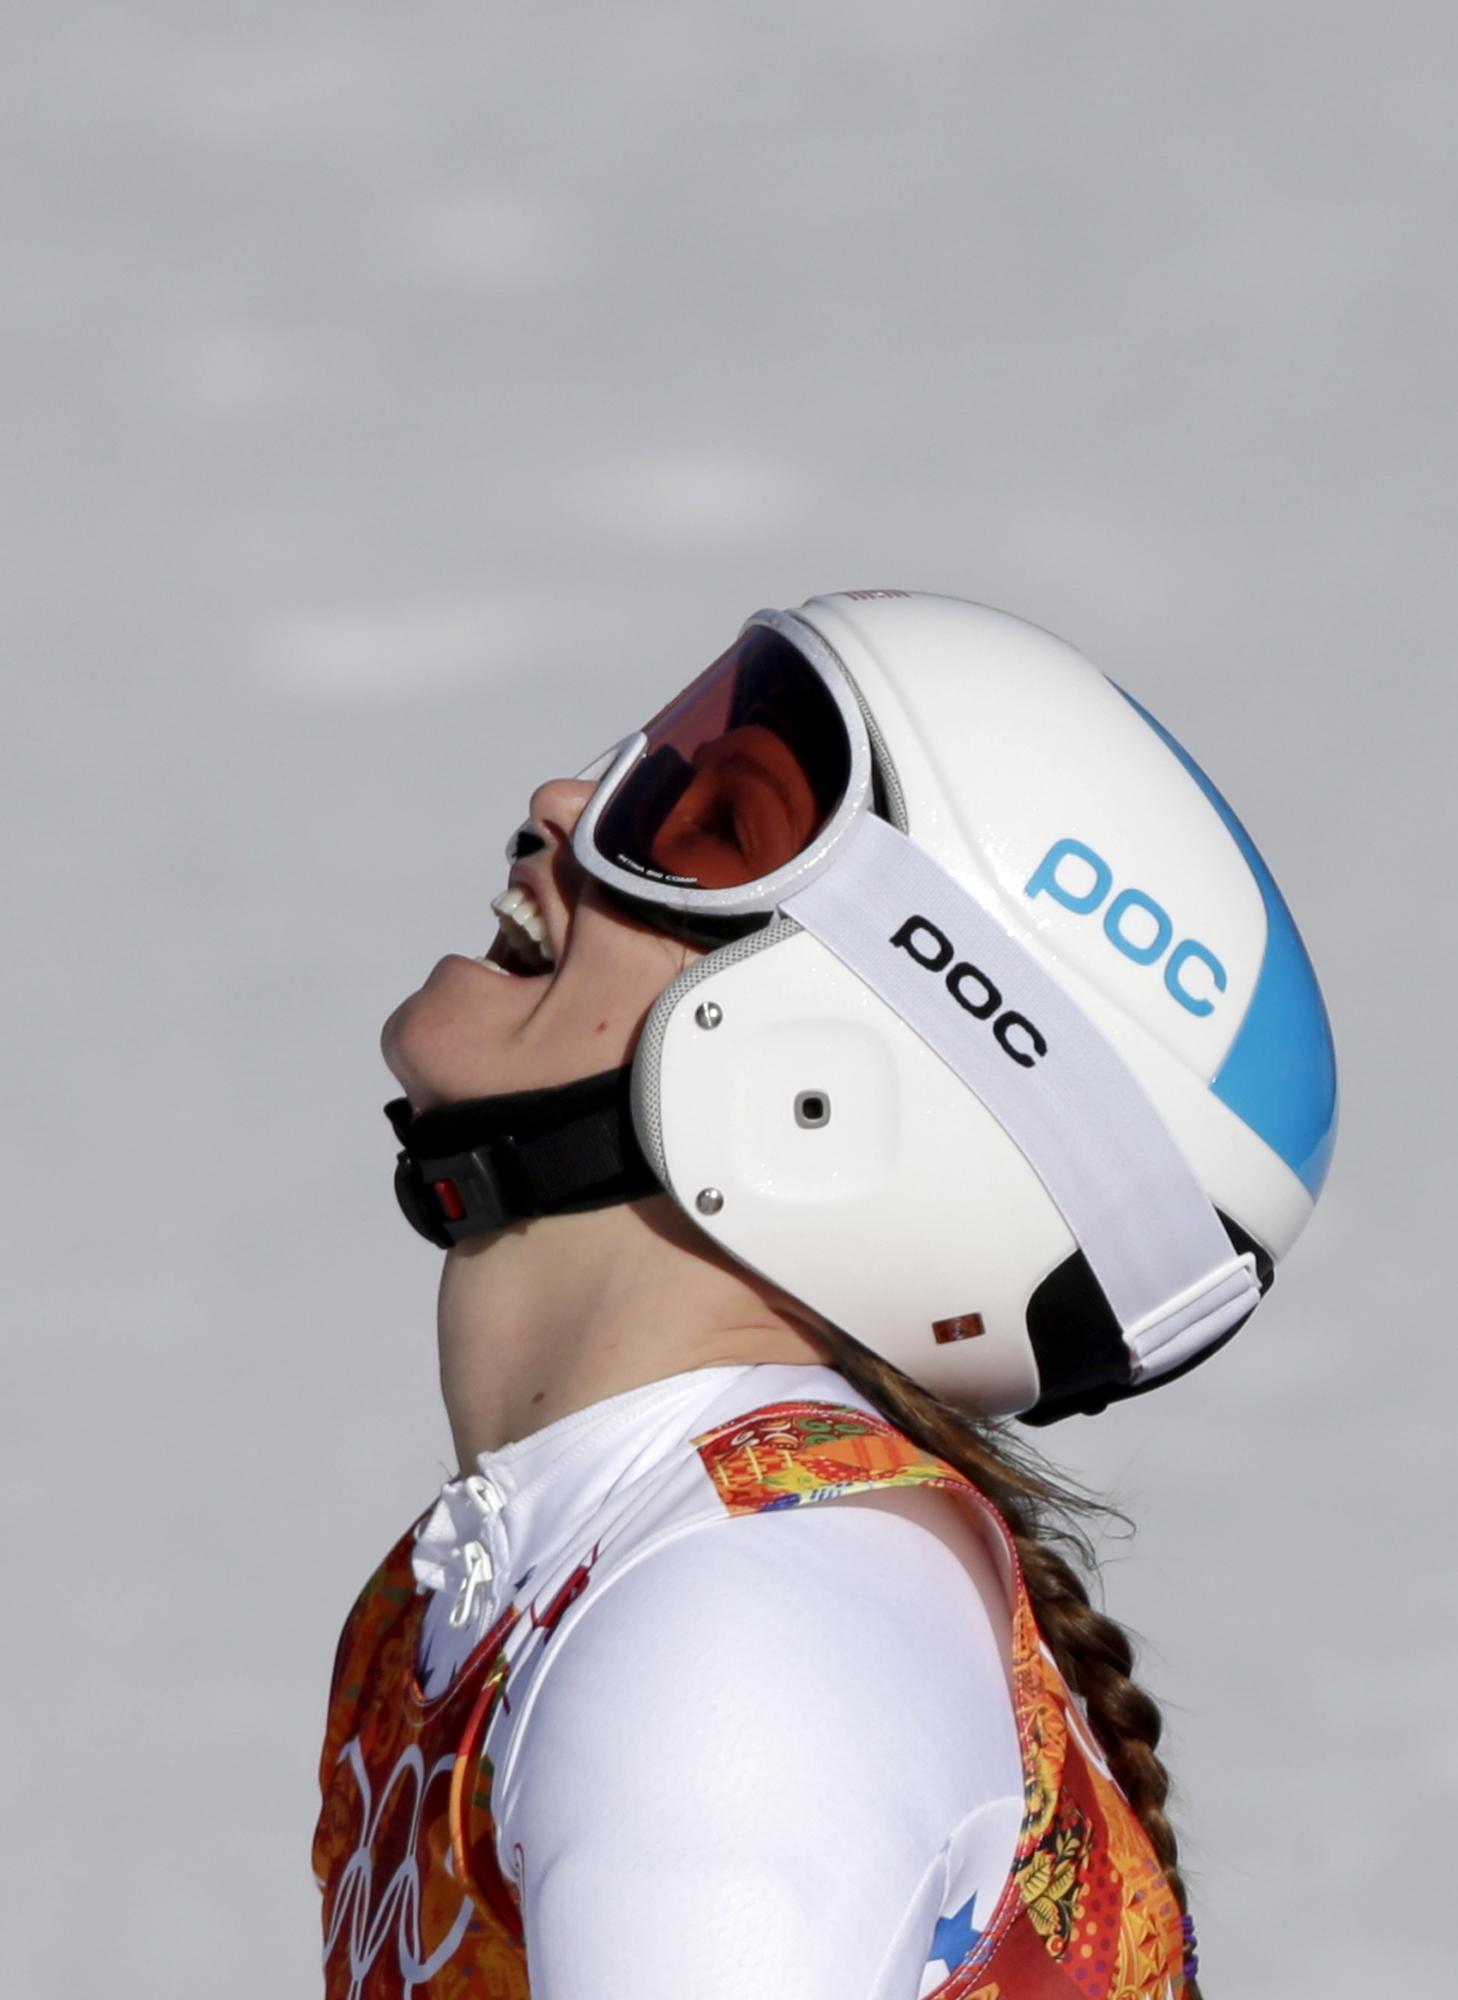 United States' Julia Mancuso catches her breath at the end of the women's super-G at the Sochi 2014 Winter Olympics, Saturday, Feb. 15, 2014, in Krasnaya Polyana, Russia. (AP Photo/Gero Breloer)